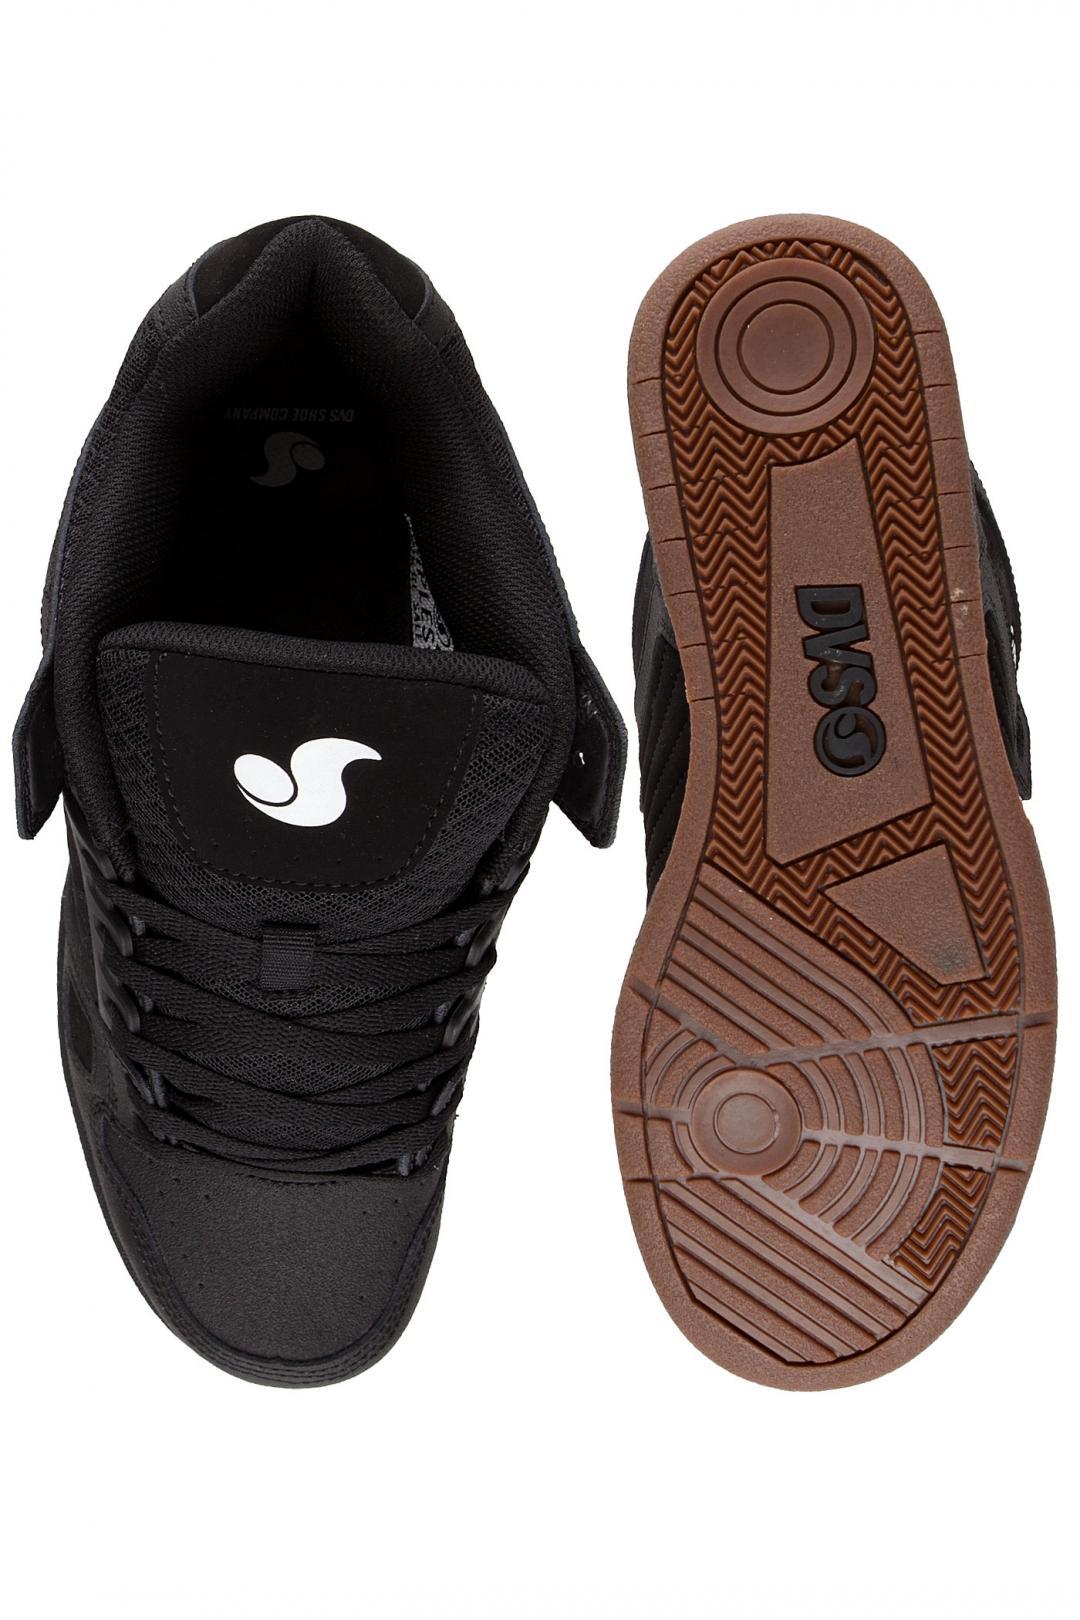 Uomo DVS Celsius Leather black ha | Scarpe invernali